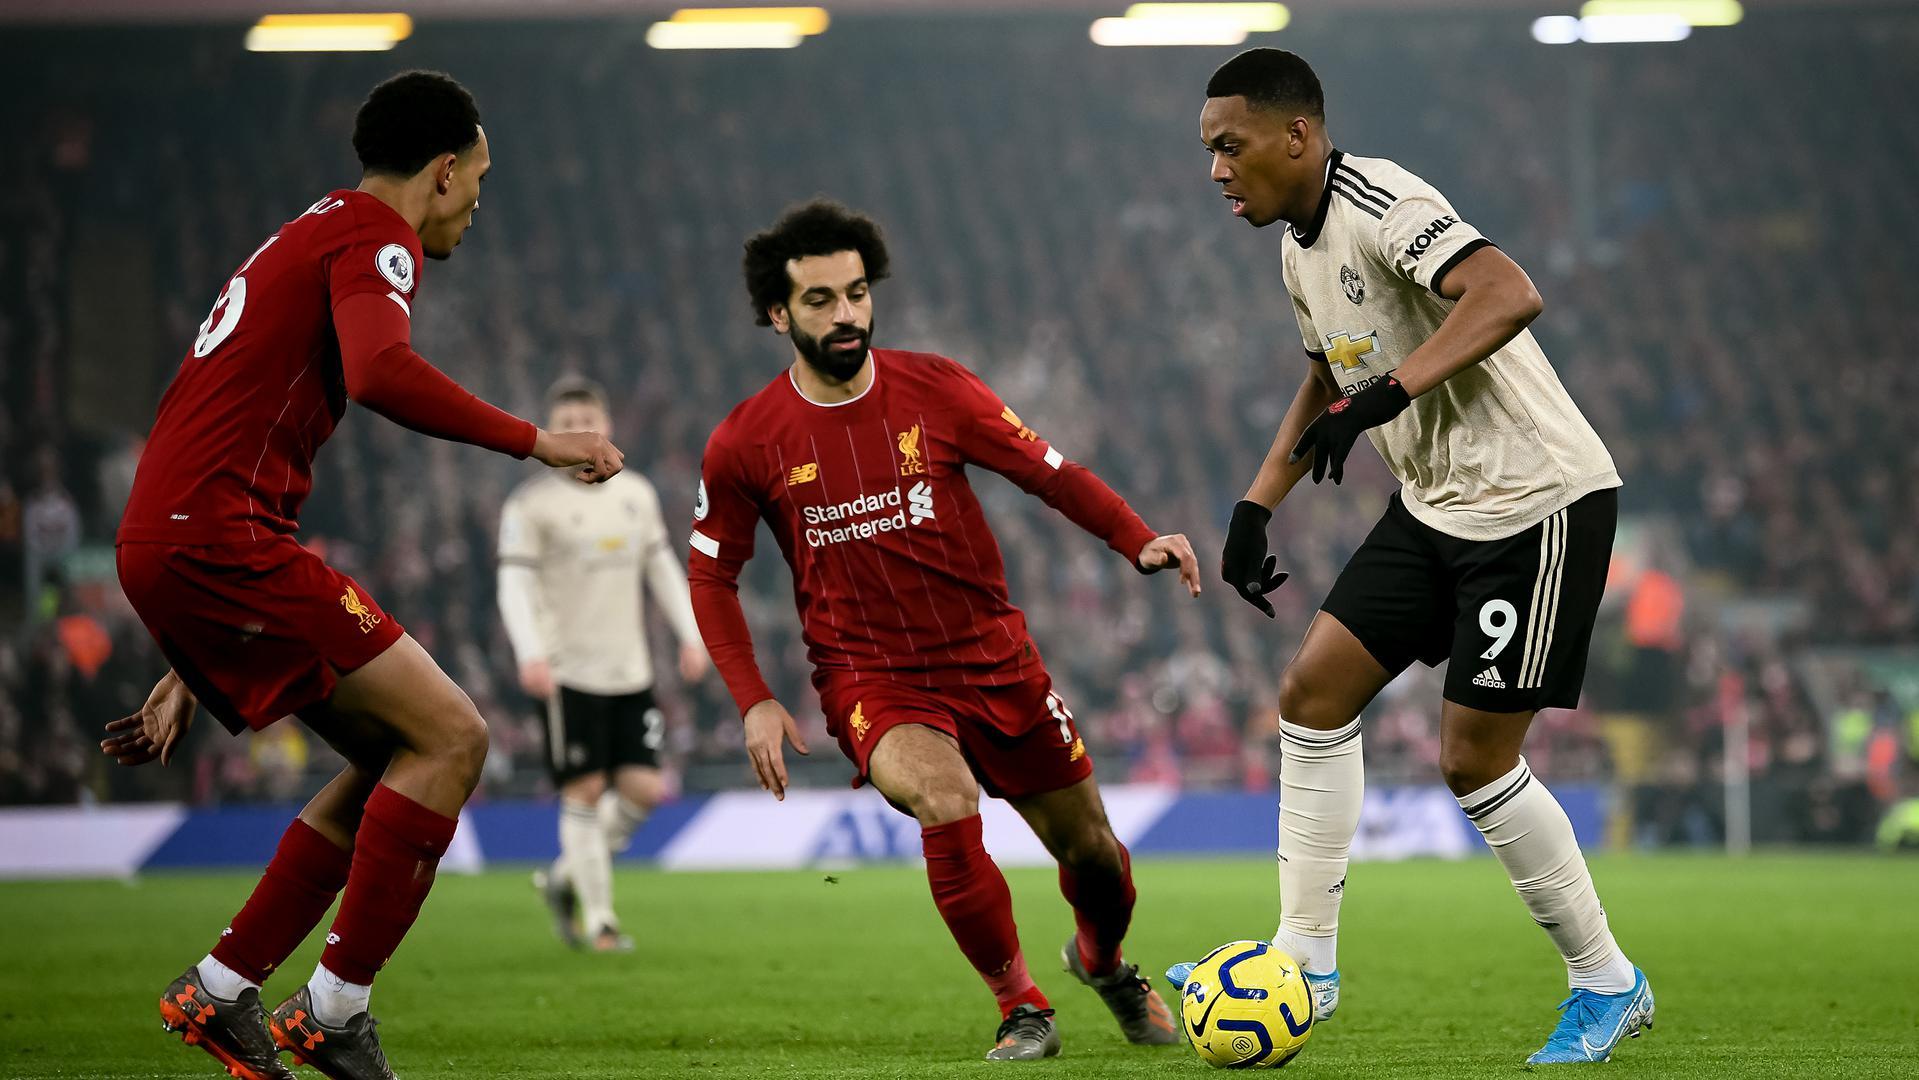 Liverpool Man United odds